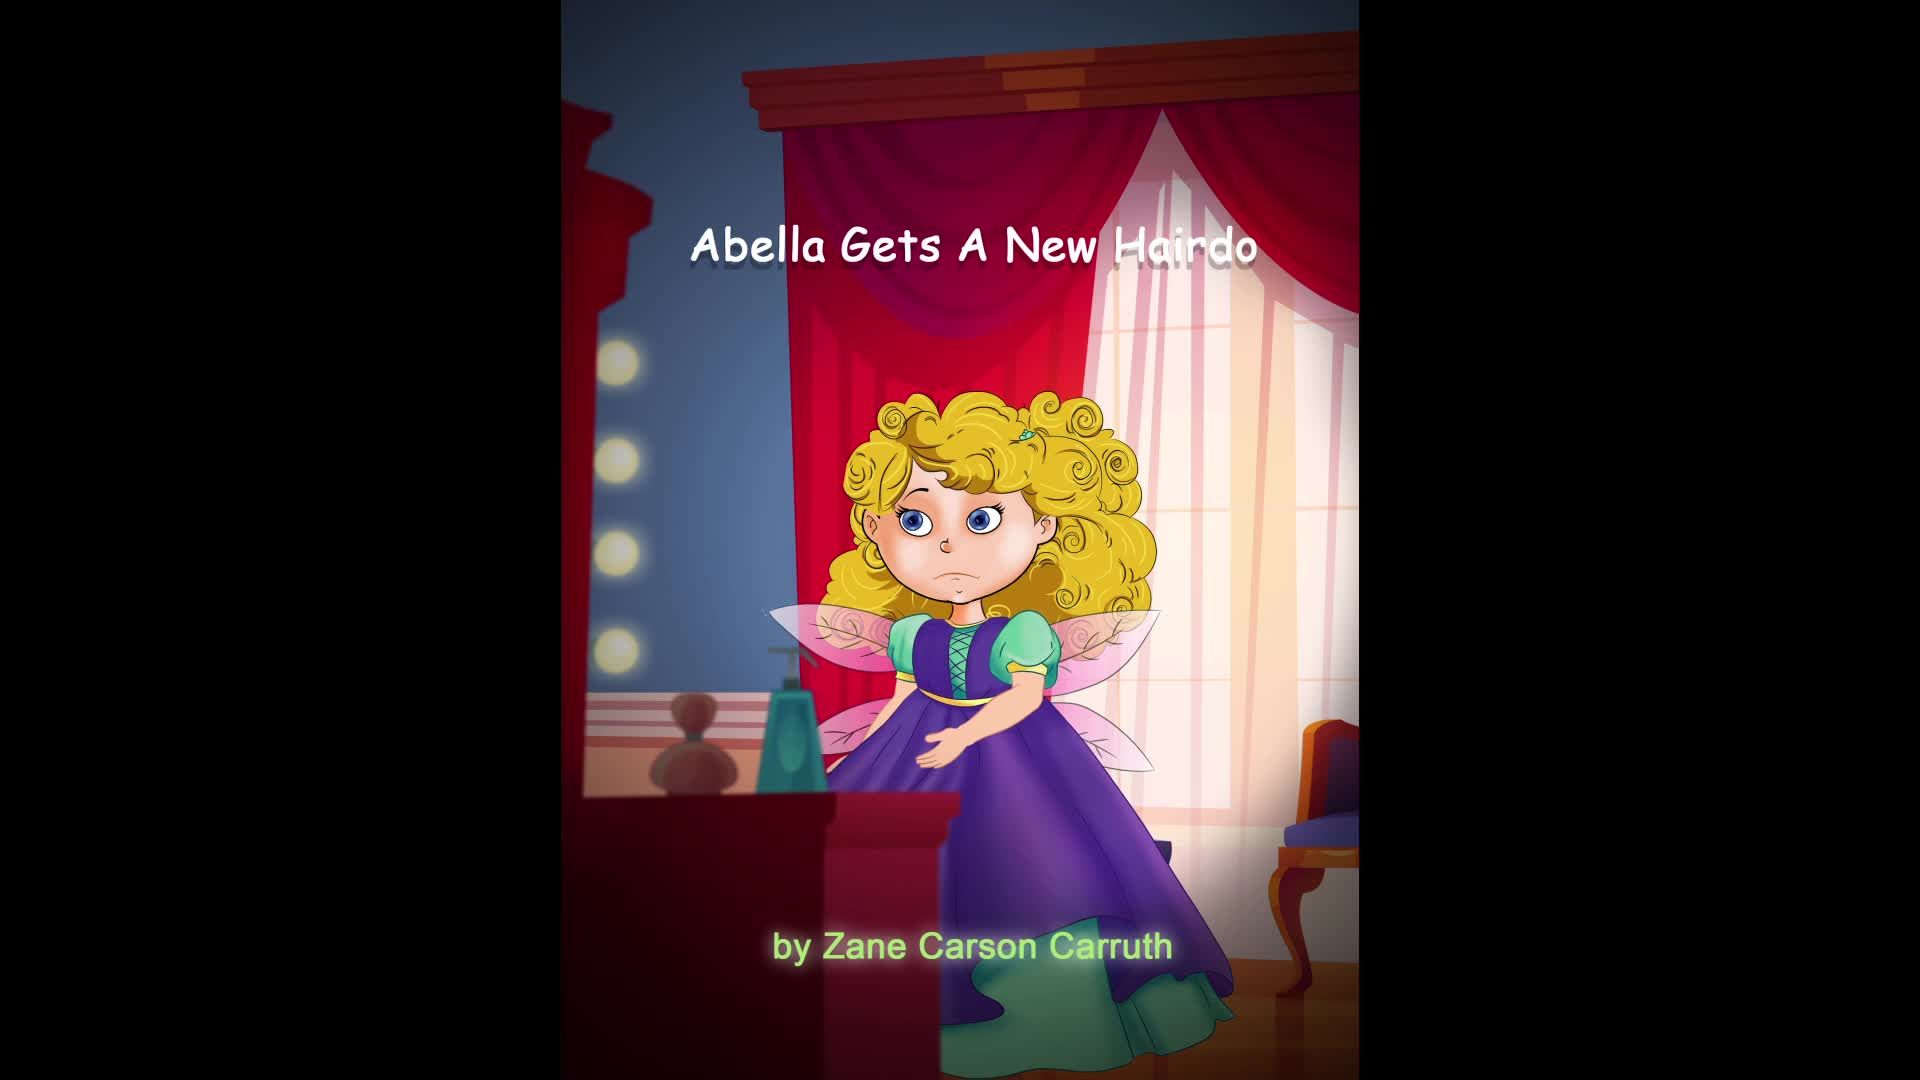 Abella Gets A New Hairdo